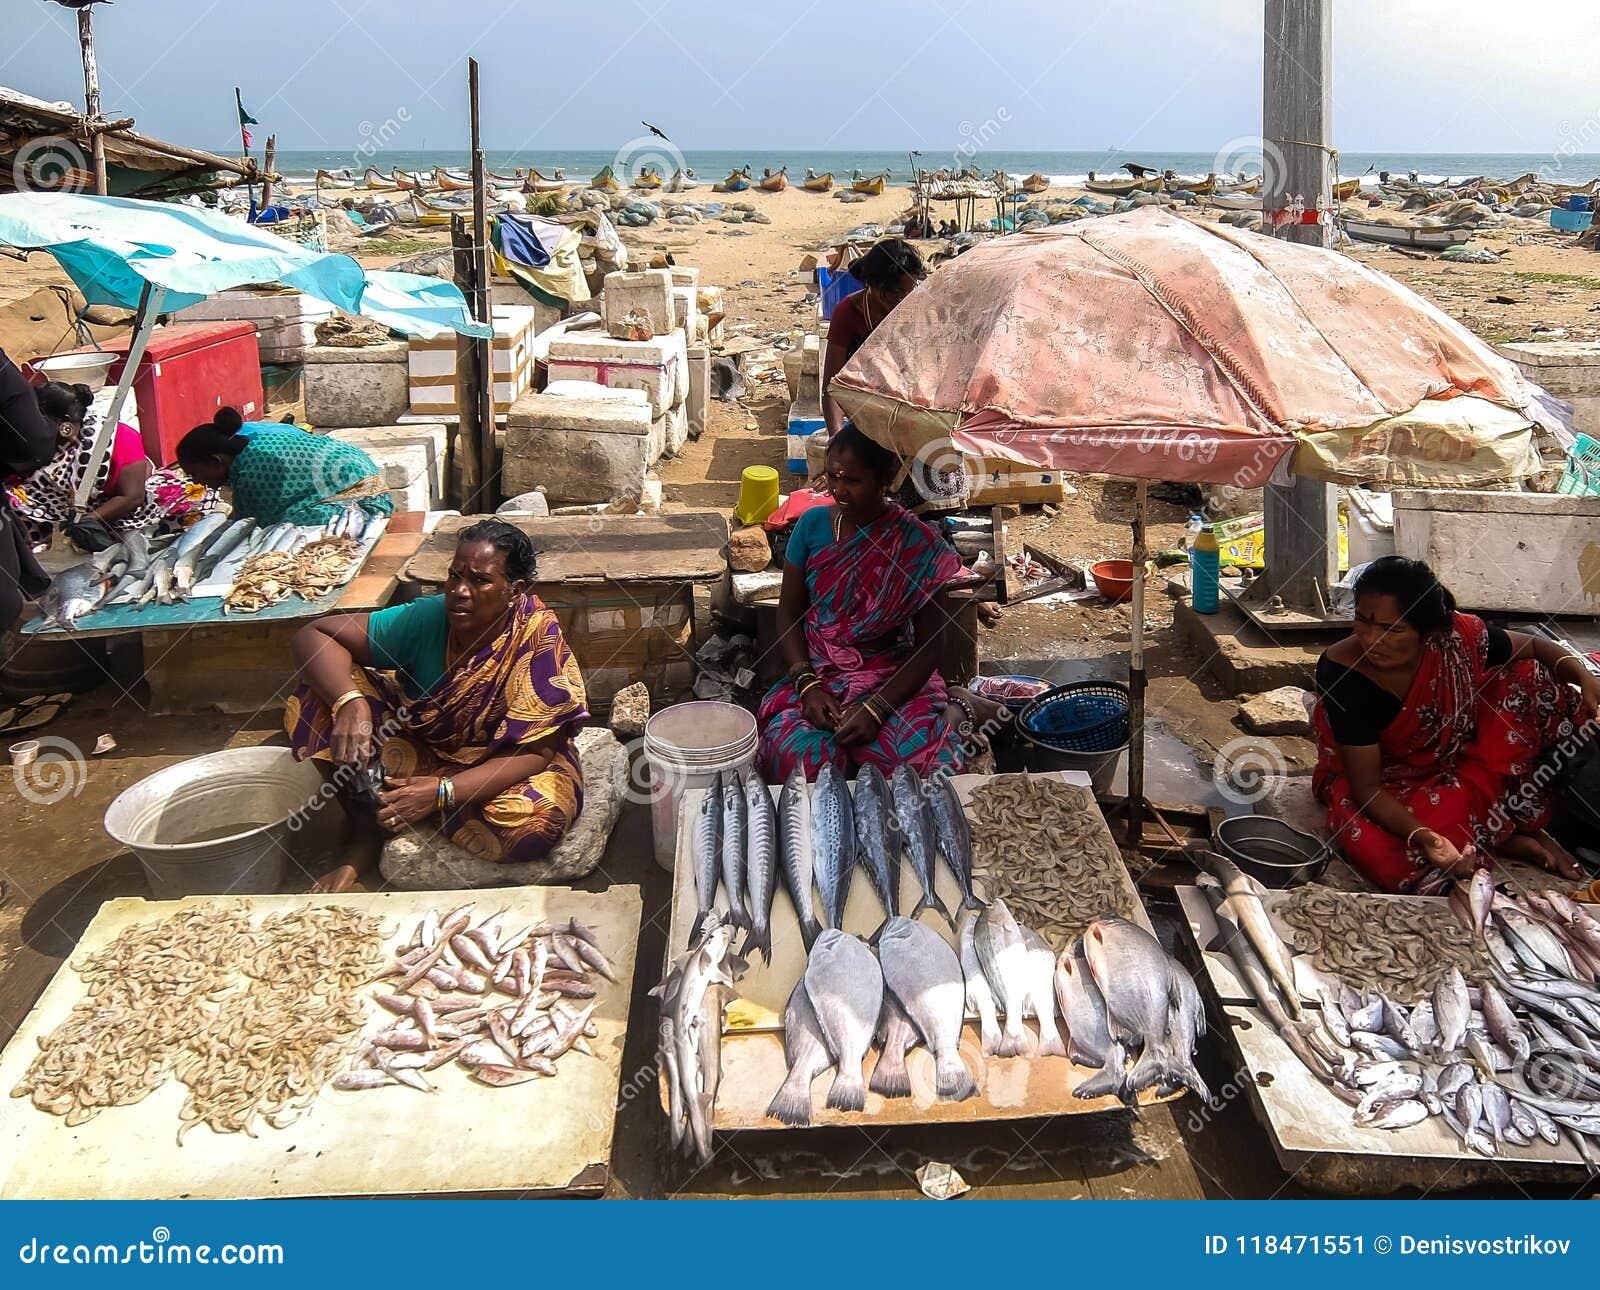 Local fish market on the road near the beach in Chennai, India.